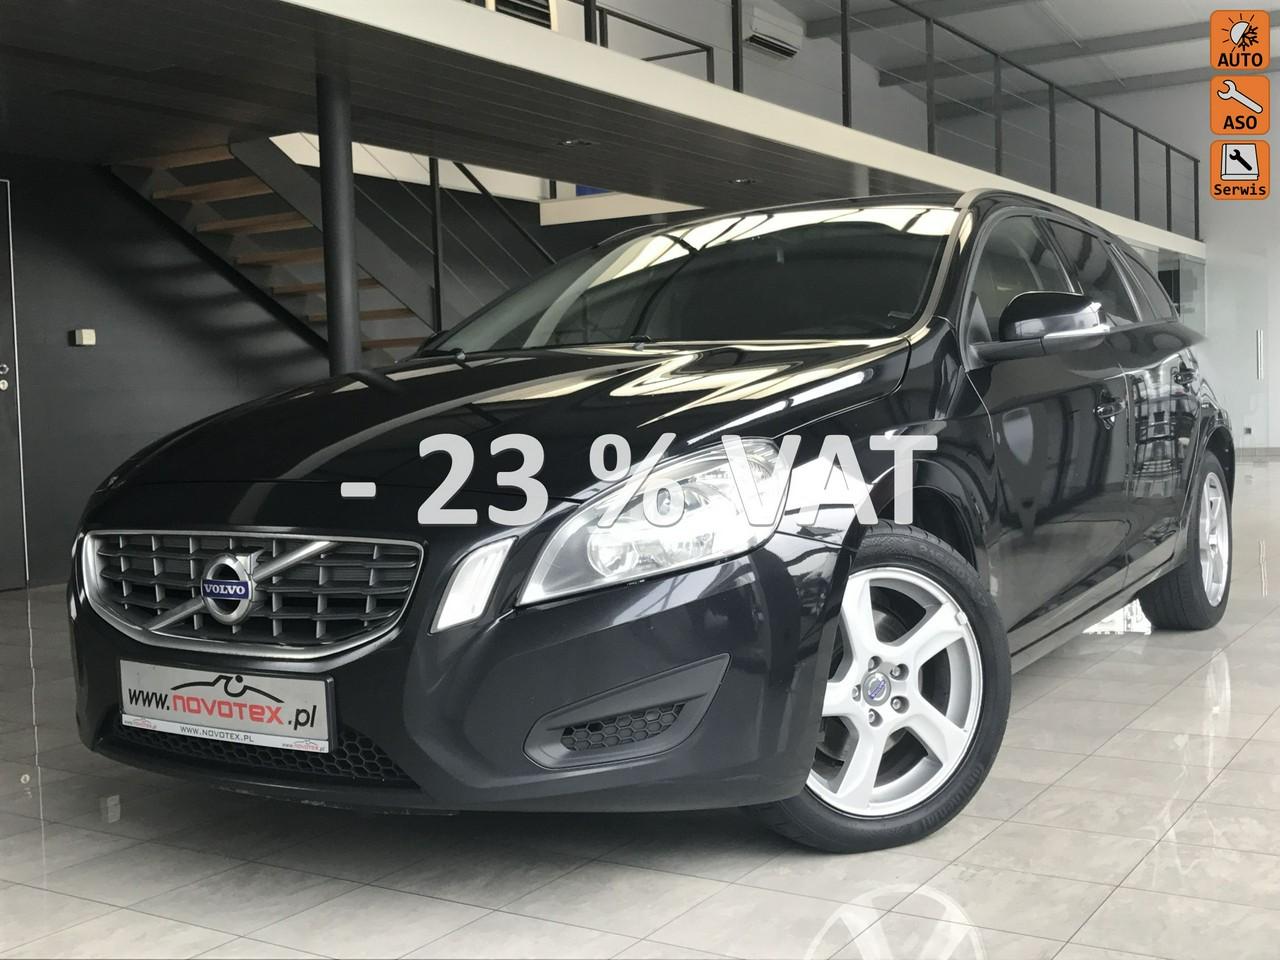 Volvo V60 D2*Momentum*alu 17*serwis w ASO*Gwarancja VIP Service